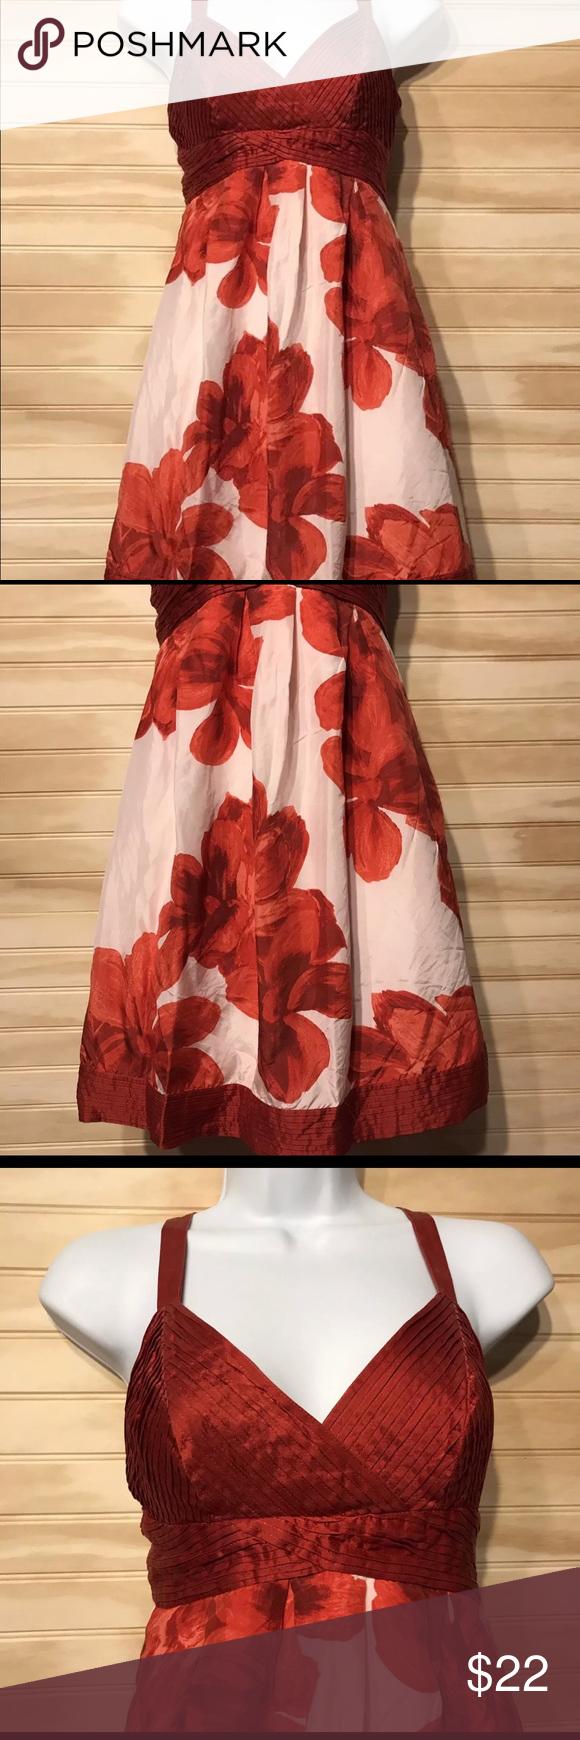 Red Guess Floral Dress Sz 5 Red Guess Jeans Floral Flower Silk Sz 5 Spaghetti Straps Dress Guess Dresses Clothes Design Dresses Floral Dress [ 1740 x 580 Pixel ]